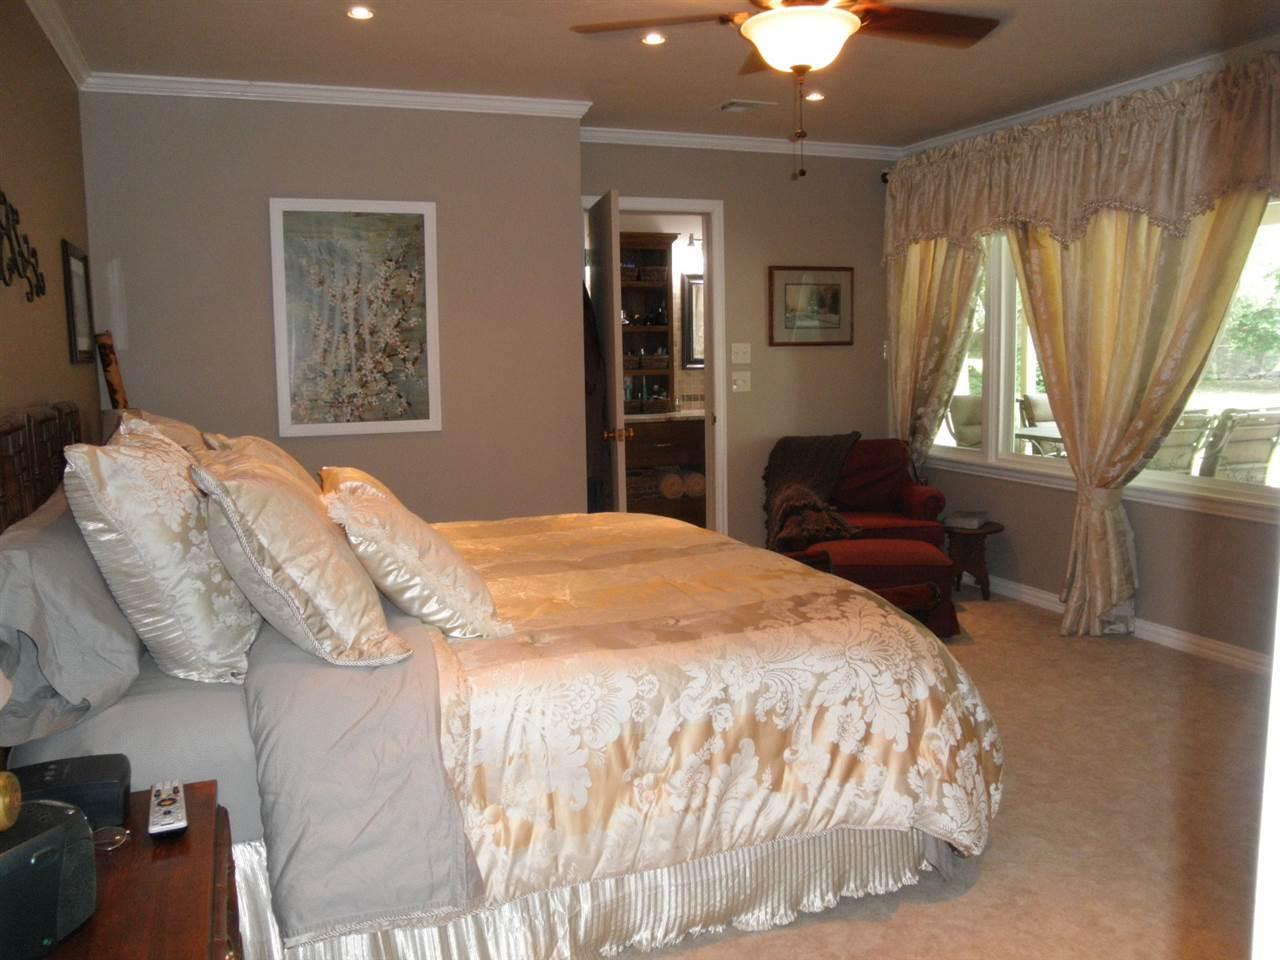 Sold Cross Sale W/ MLS | 127 Fairview  Ponca City, OK 74601 25